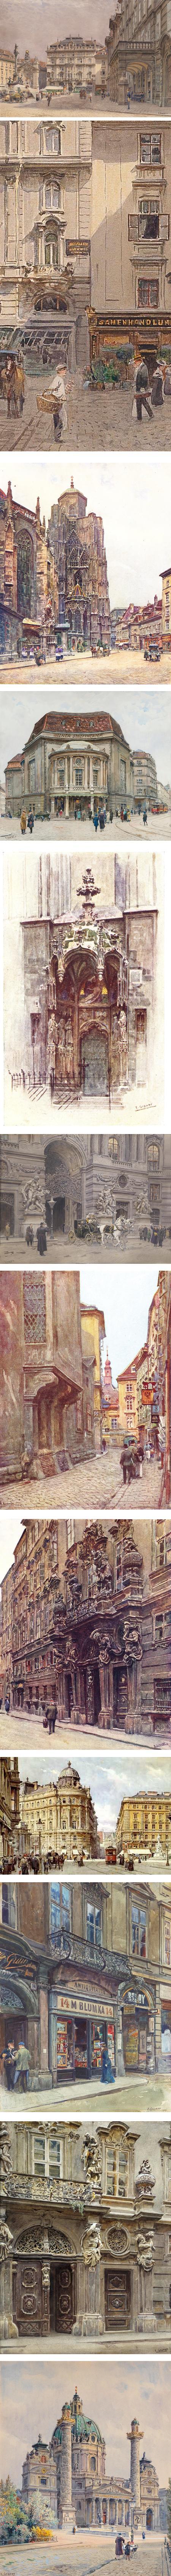 Ernst Graner, Austrian watercolor painter, watercolors of Vienna